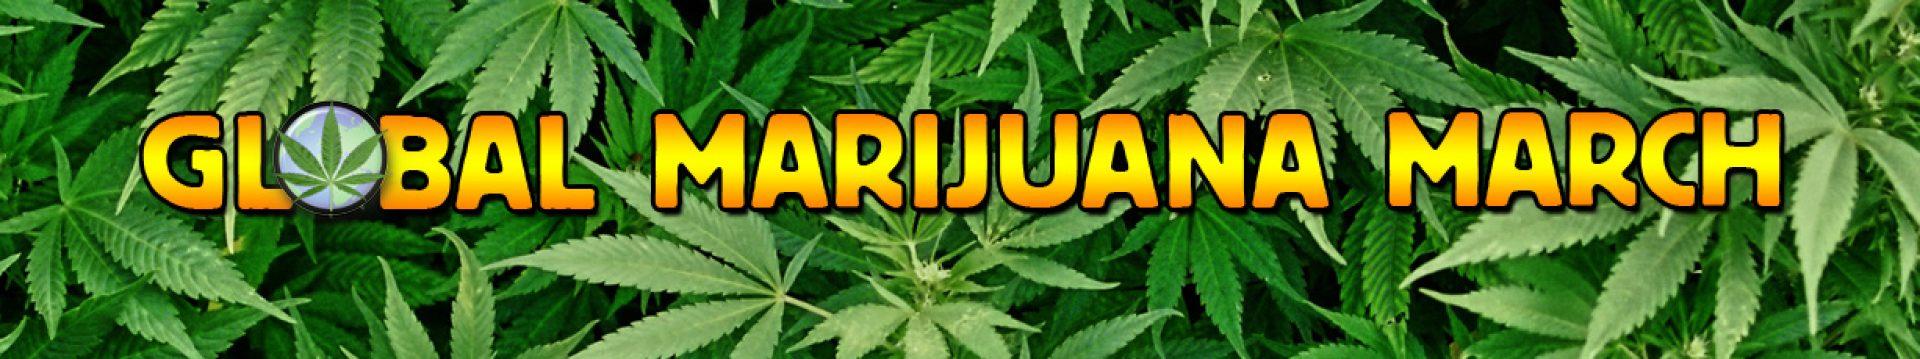 Global Marijuana March Dortmund